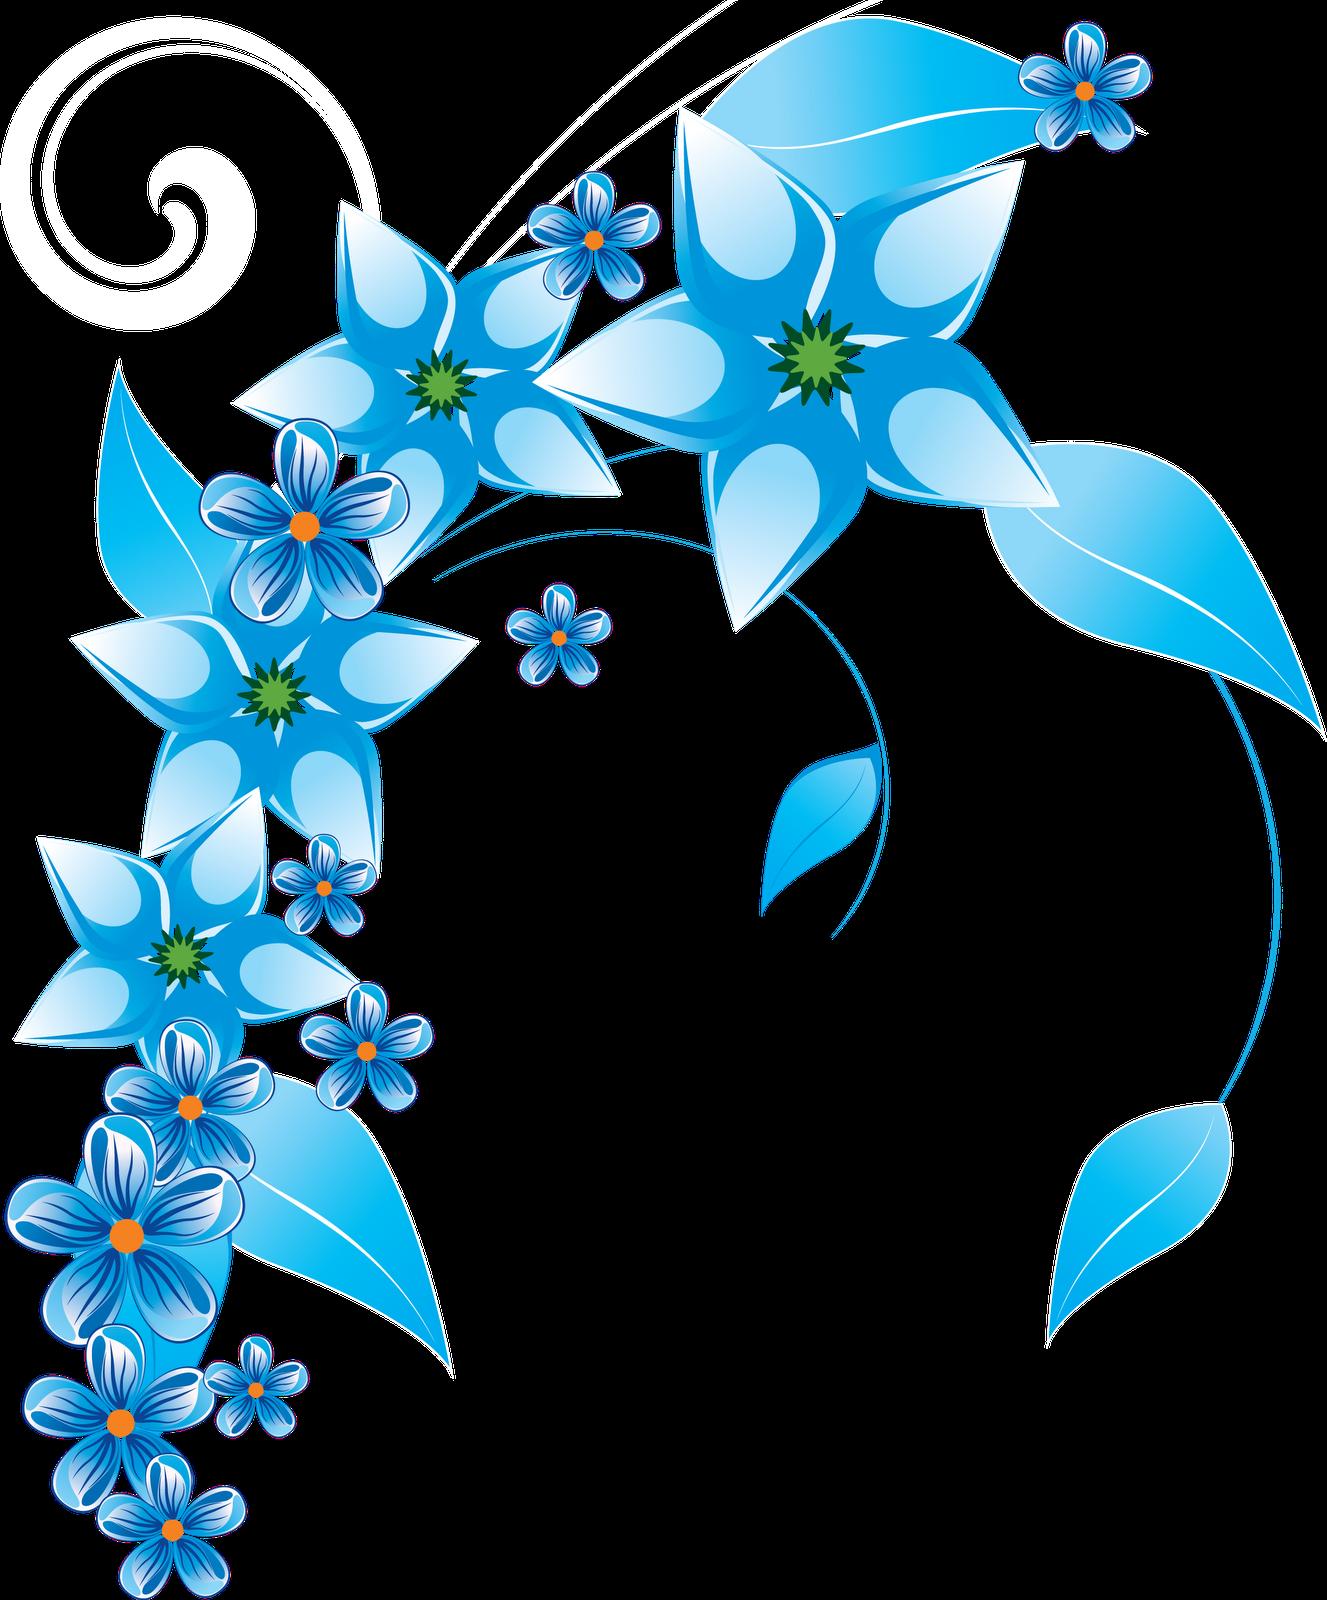 blue flower vectors various images 4754 transparentpng hydrangea clip art images hydrangea clip art border free